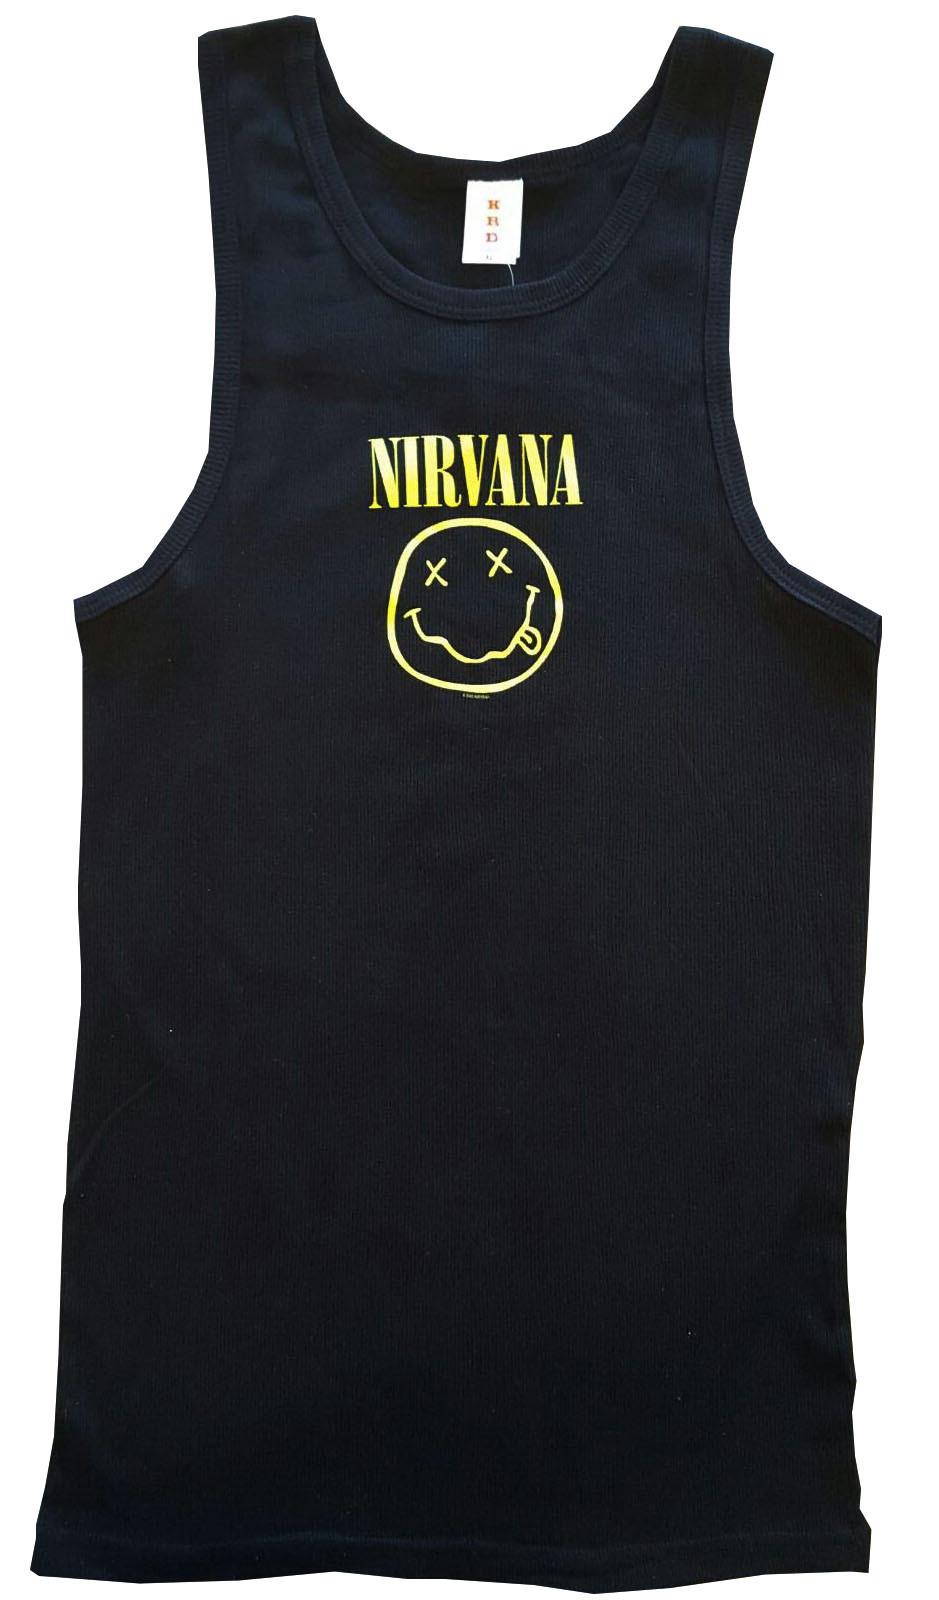 Nirvana kinder rock hemd Smiley